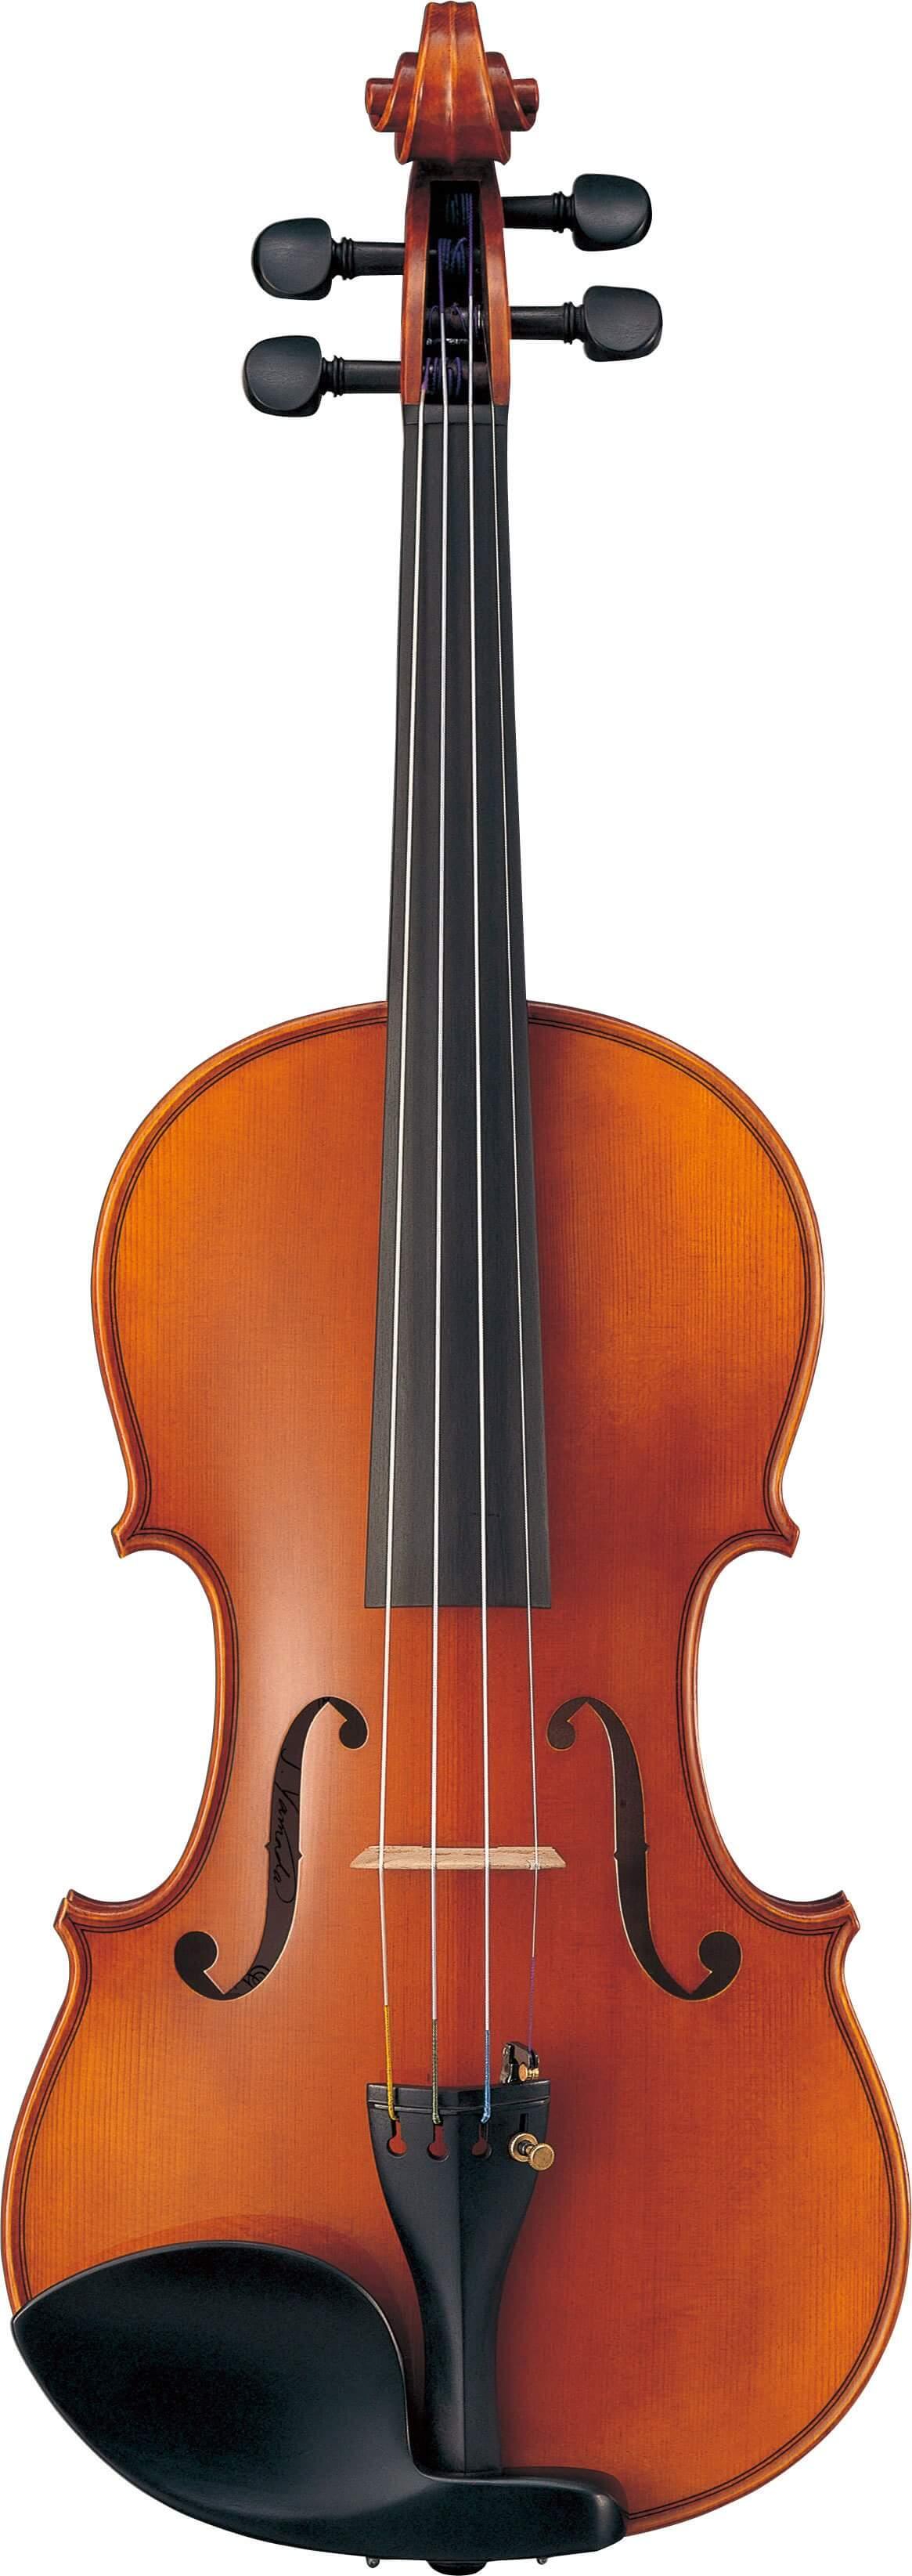 Violín Yamaha V10G 4/4. Violín sólo